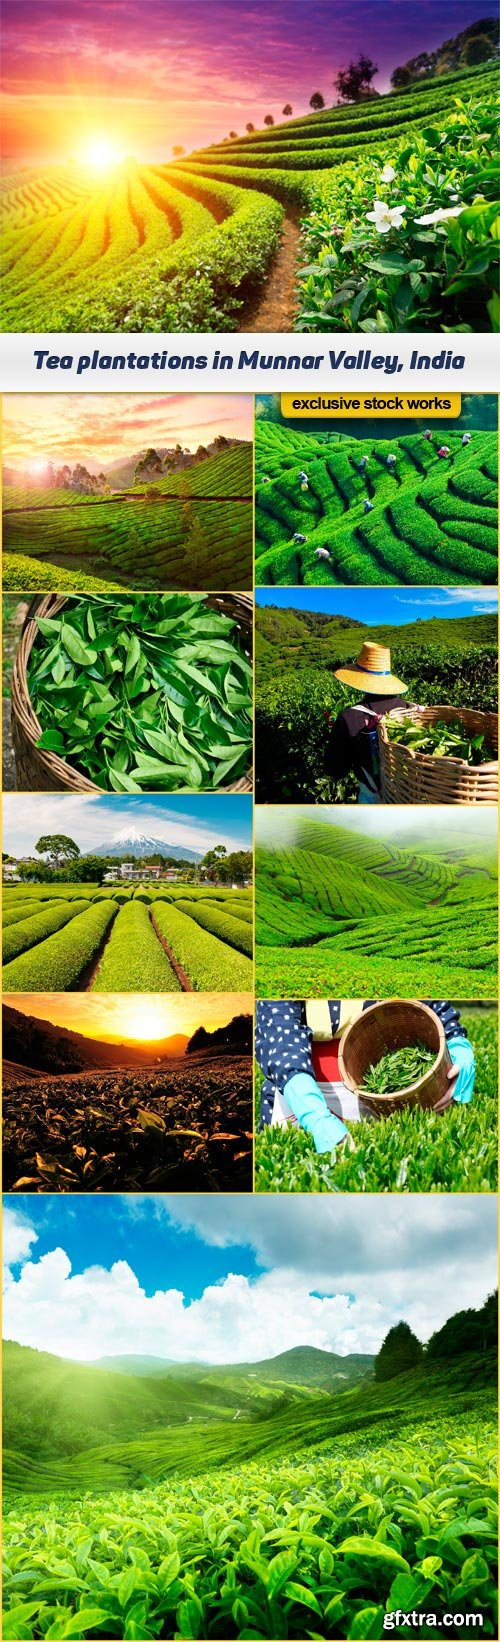 Tea plantations in Munnar Valley, Kerala, India 10x JPEG